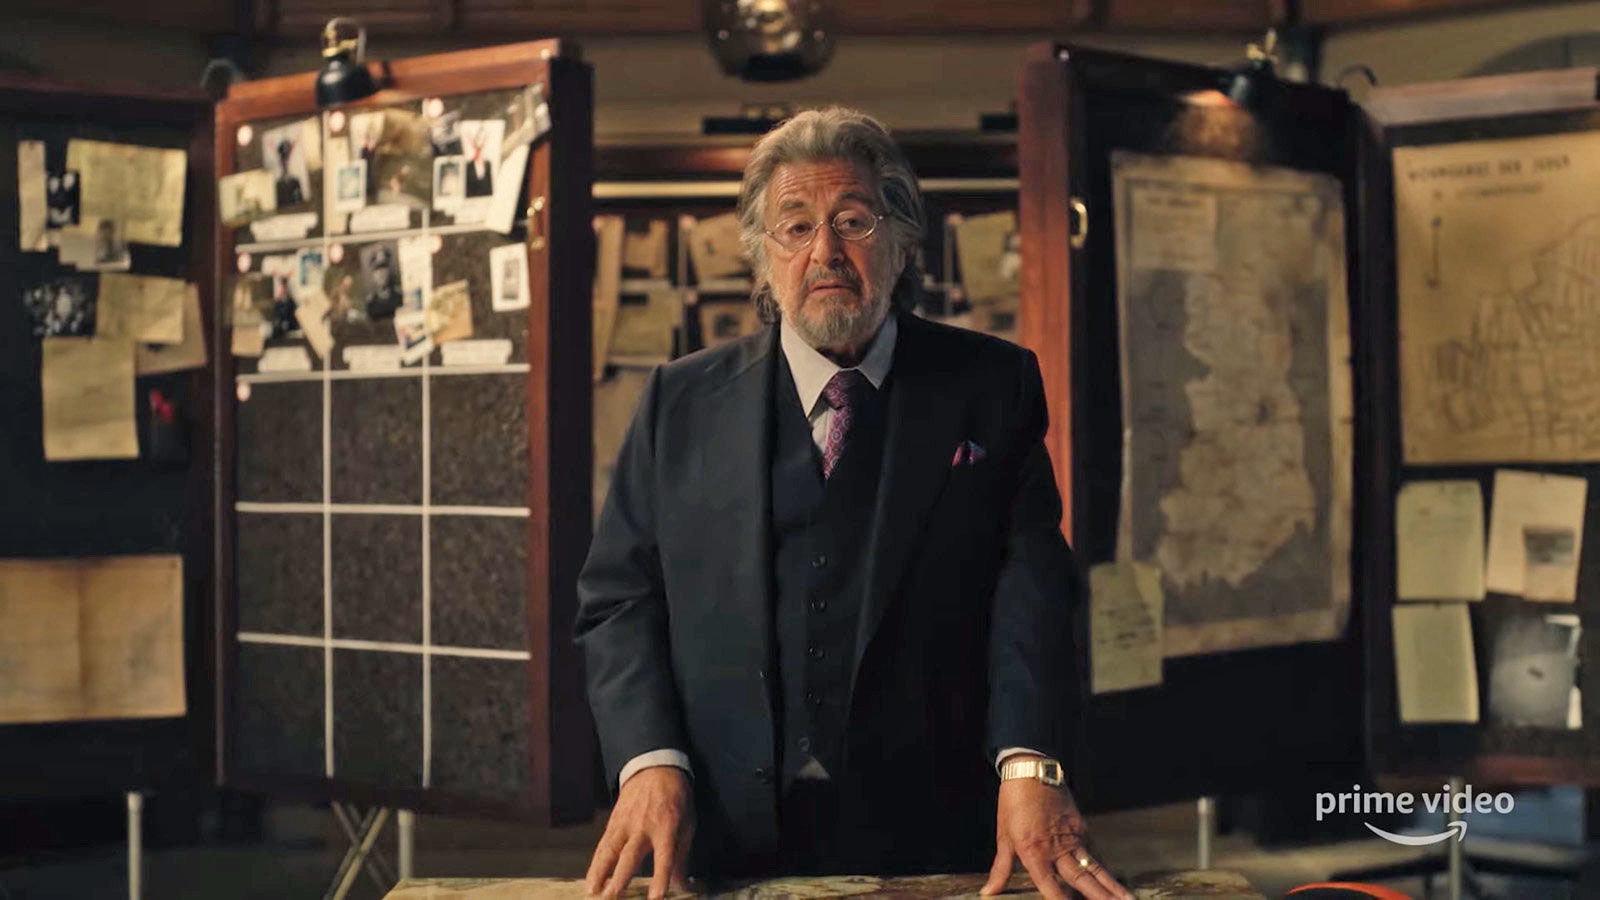 'Hunters' Series with Al Pacino Drops in February via Amazon